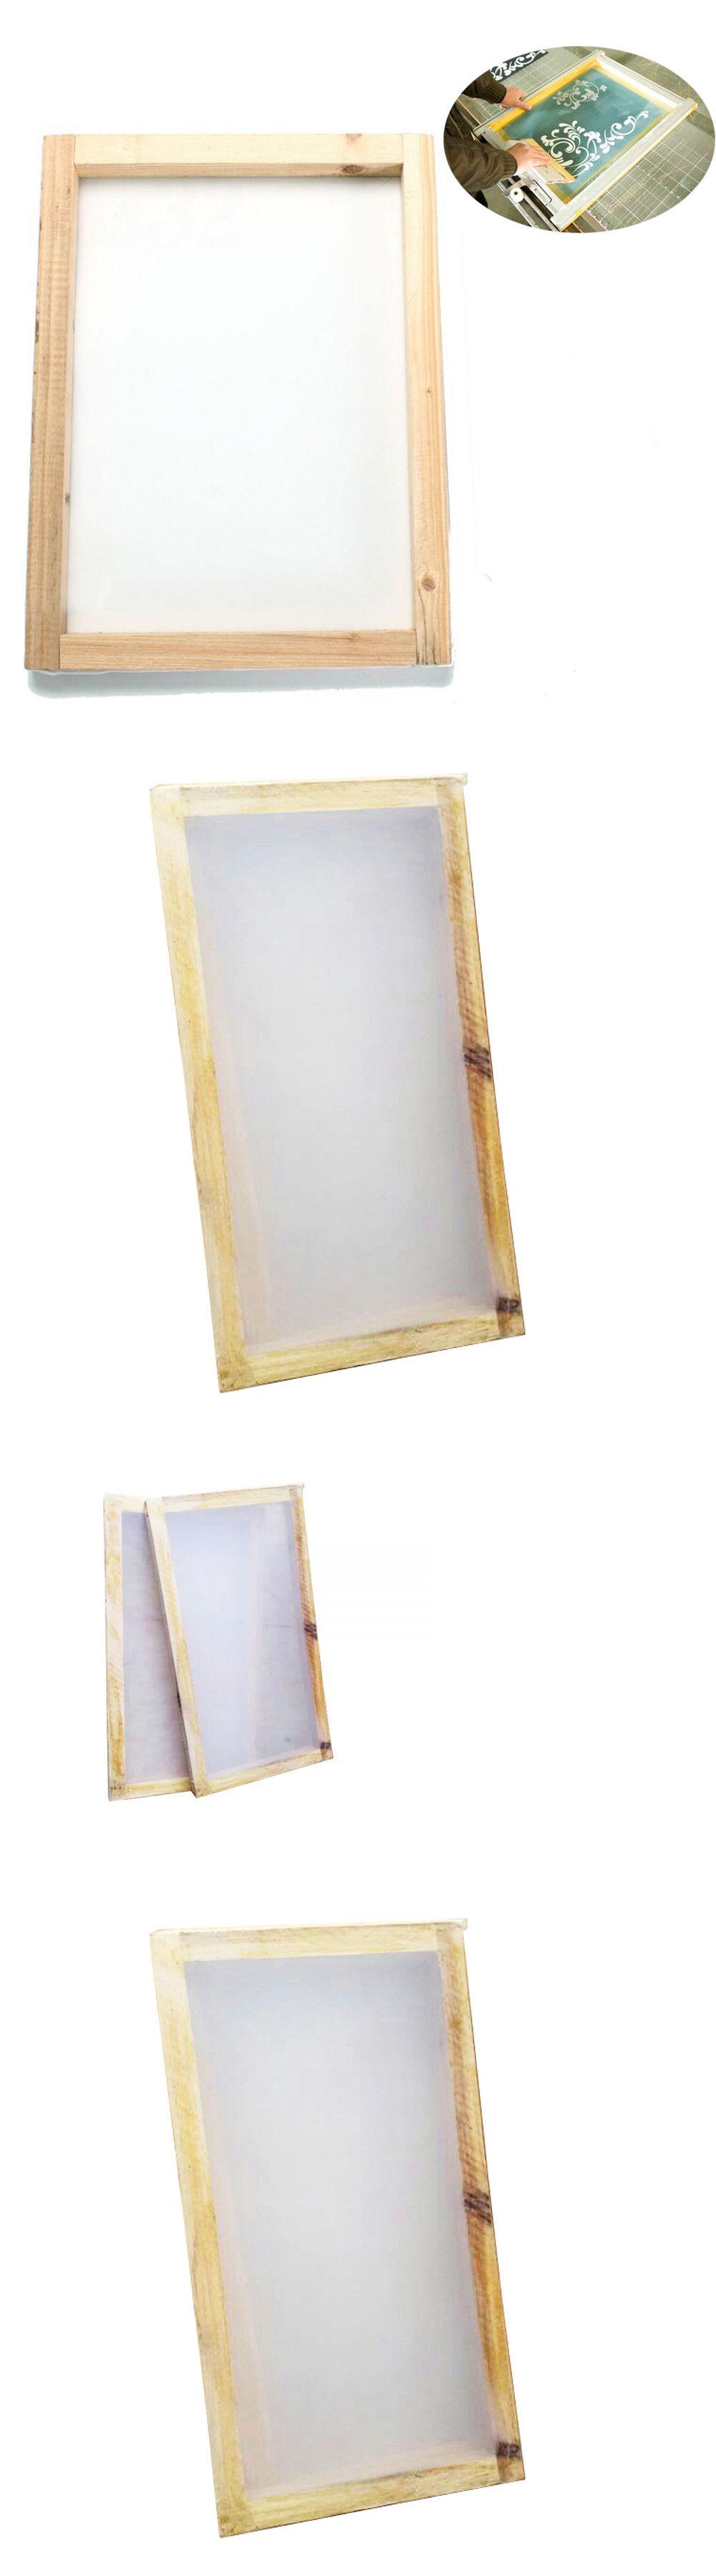 Screen Printing Frames 183114: 16Inch X 20Inch Wood Screen Printing ...